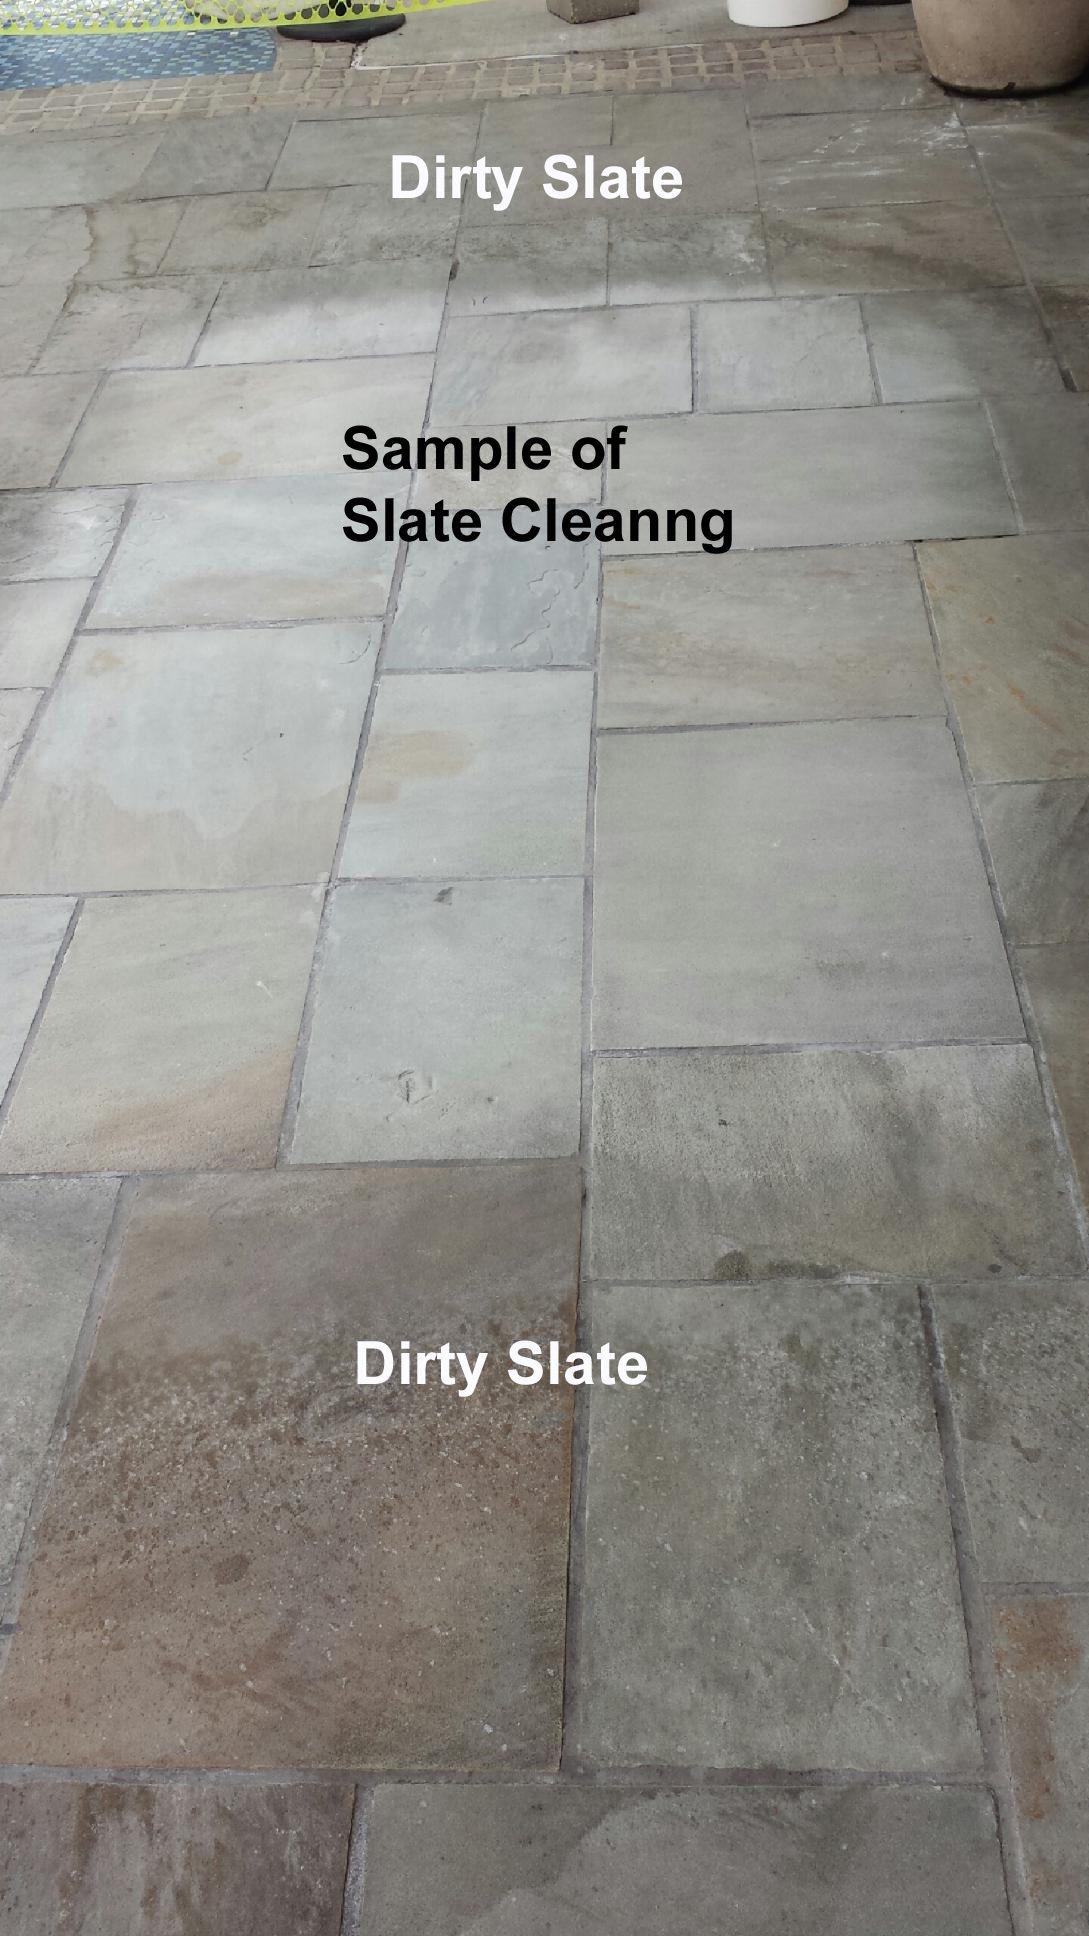 clean textured porcelain tile floors